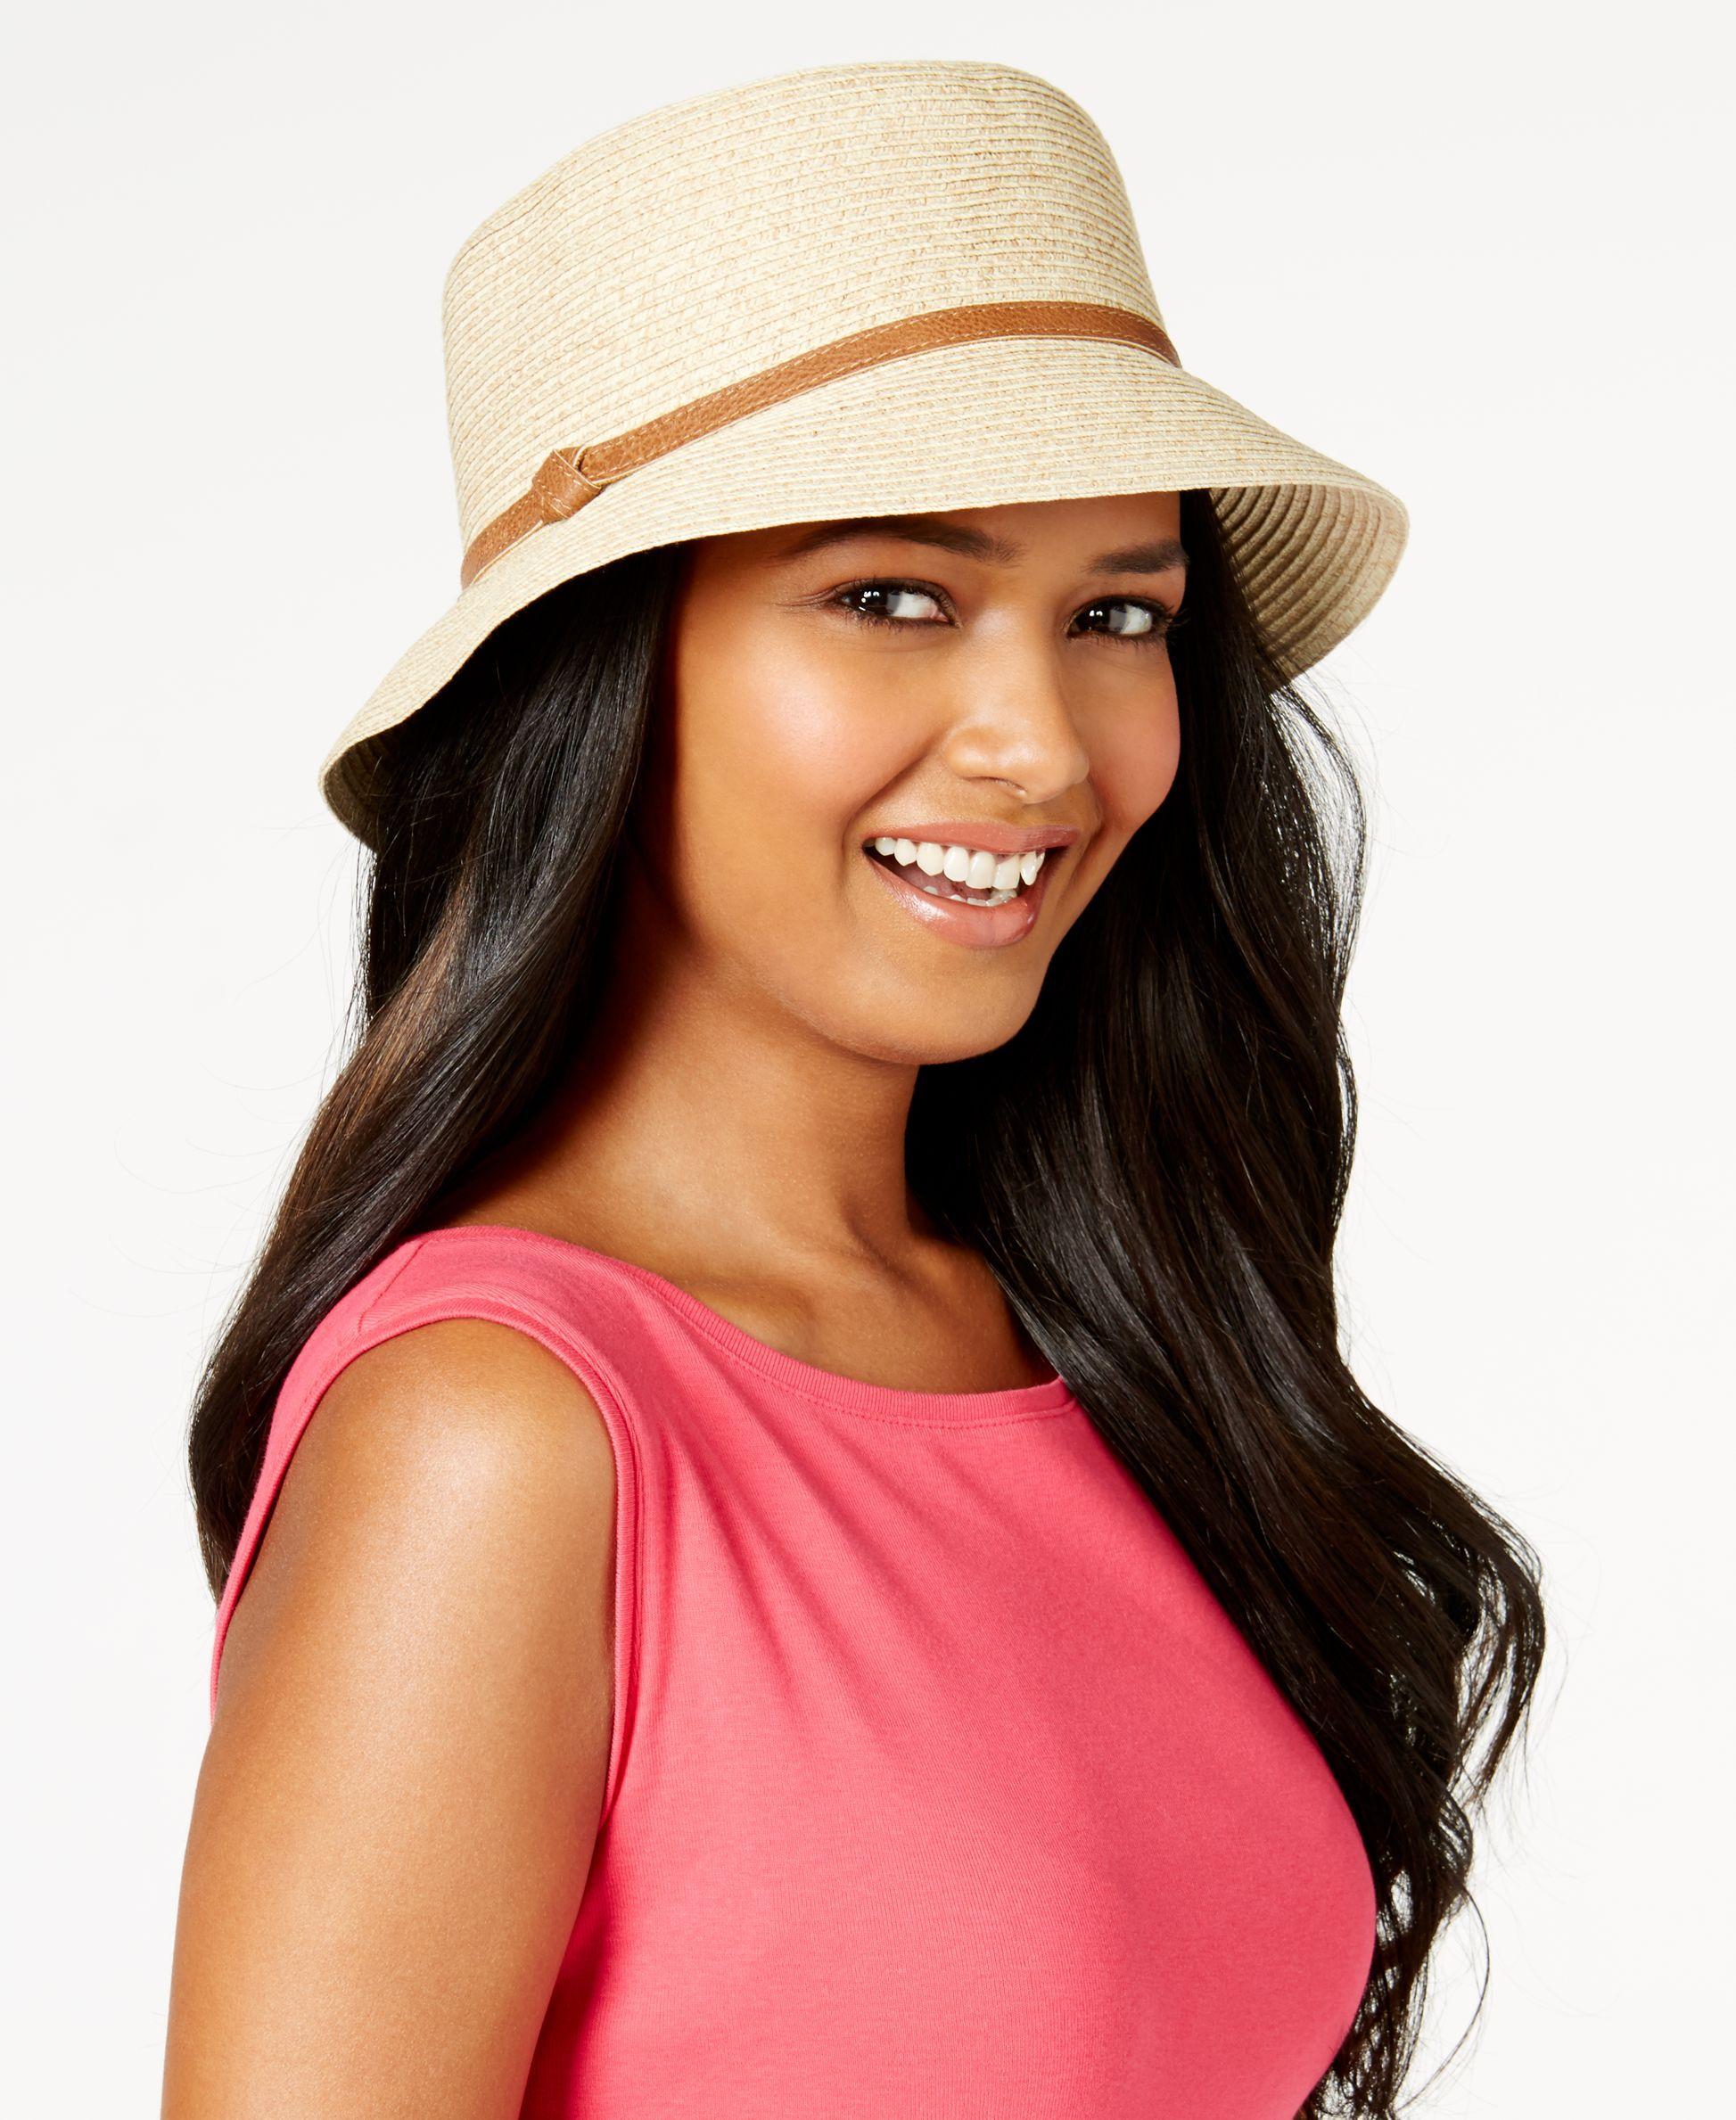 7615cdc5ac8533 Nine West Packable Microbrim Hat | Products | Hats, Handbag ...